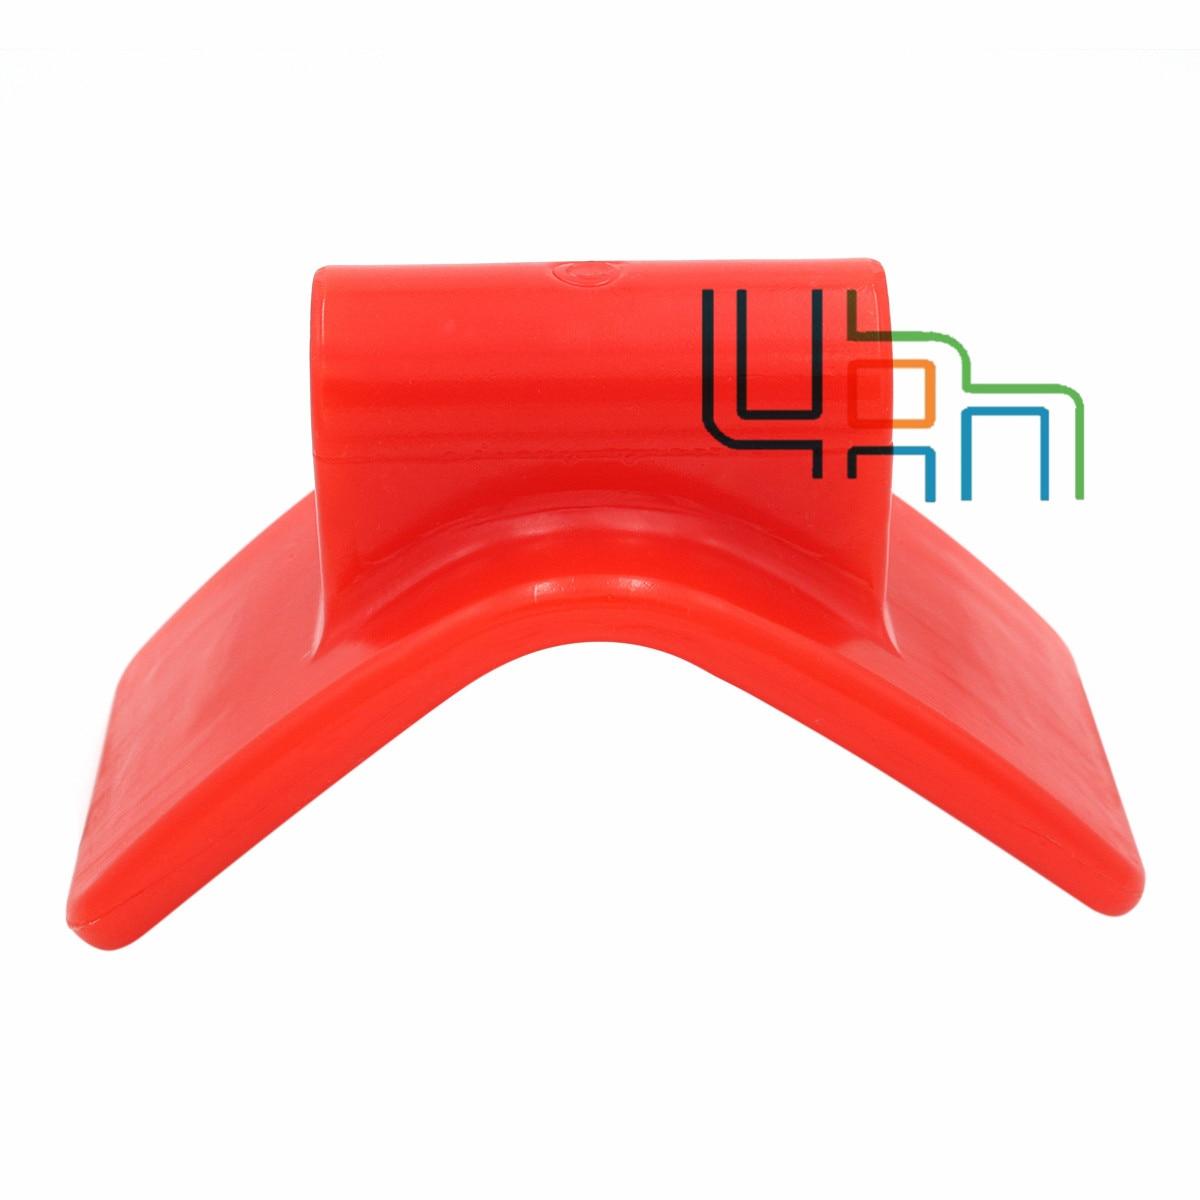 3 pulgadas v Anchura de montaje arco Stop Roller para remolque de barco no marcado rojo, poliuretano